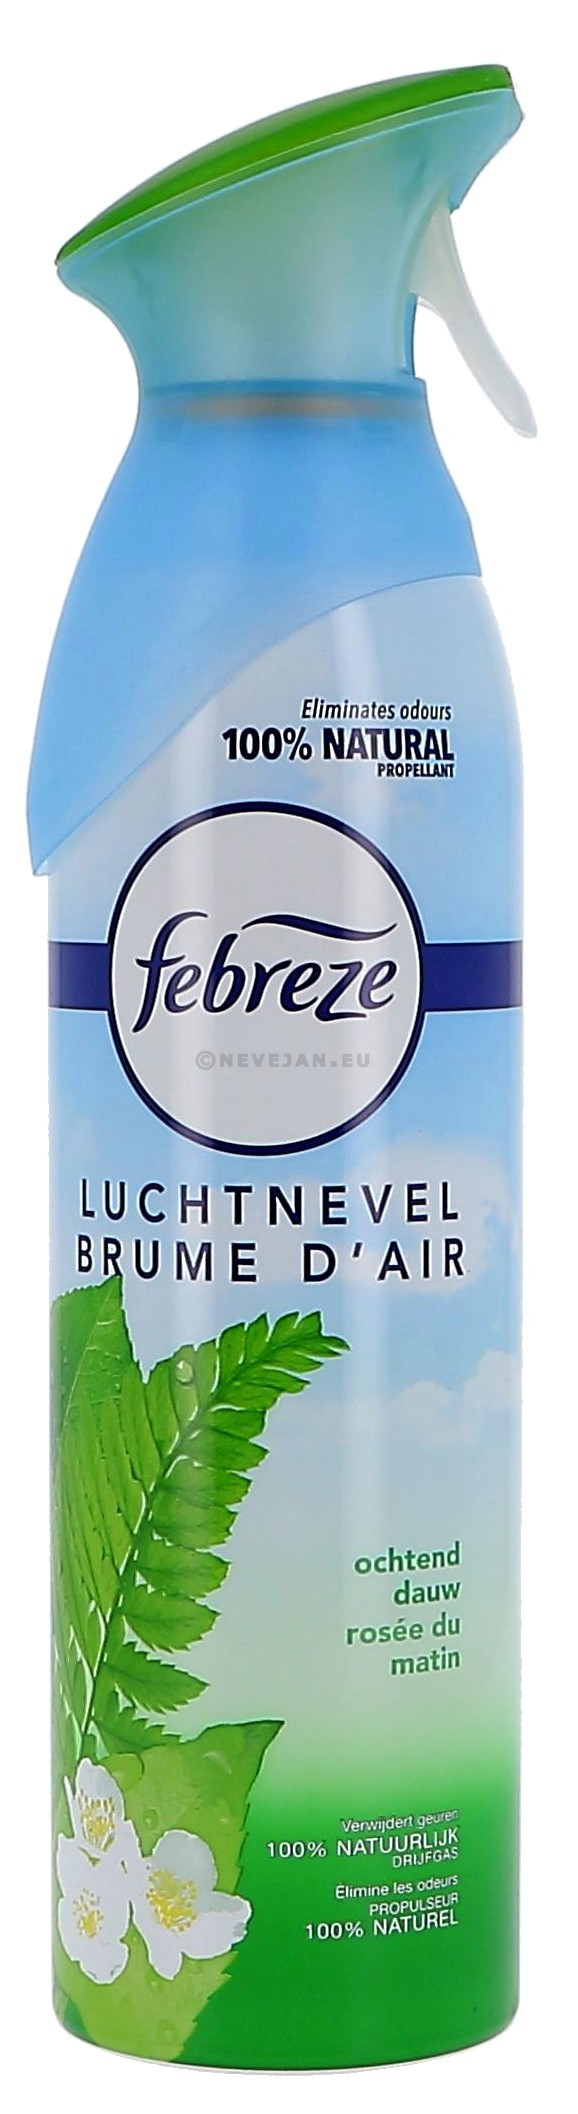 Febreze luchtnevel ochtend dauw 300ml Procter & Gamble (Reinigings-&kuisproducten)